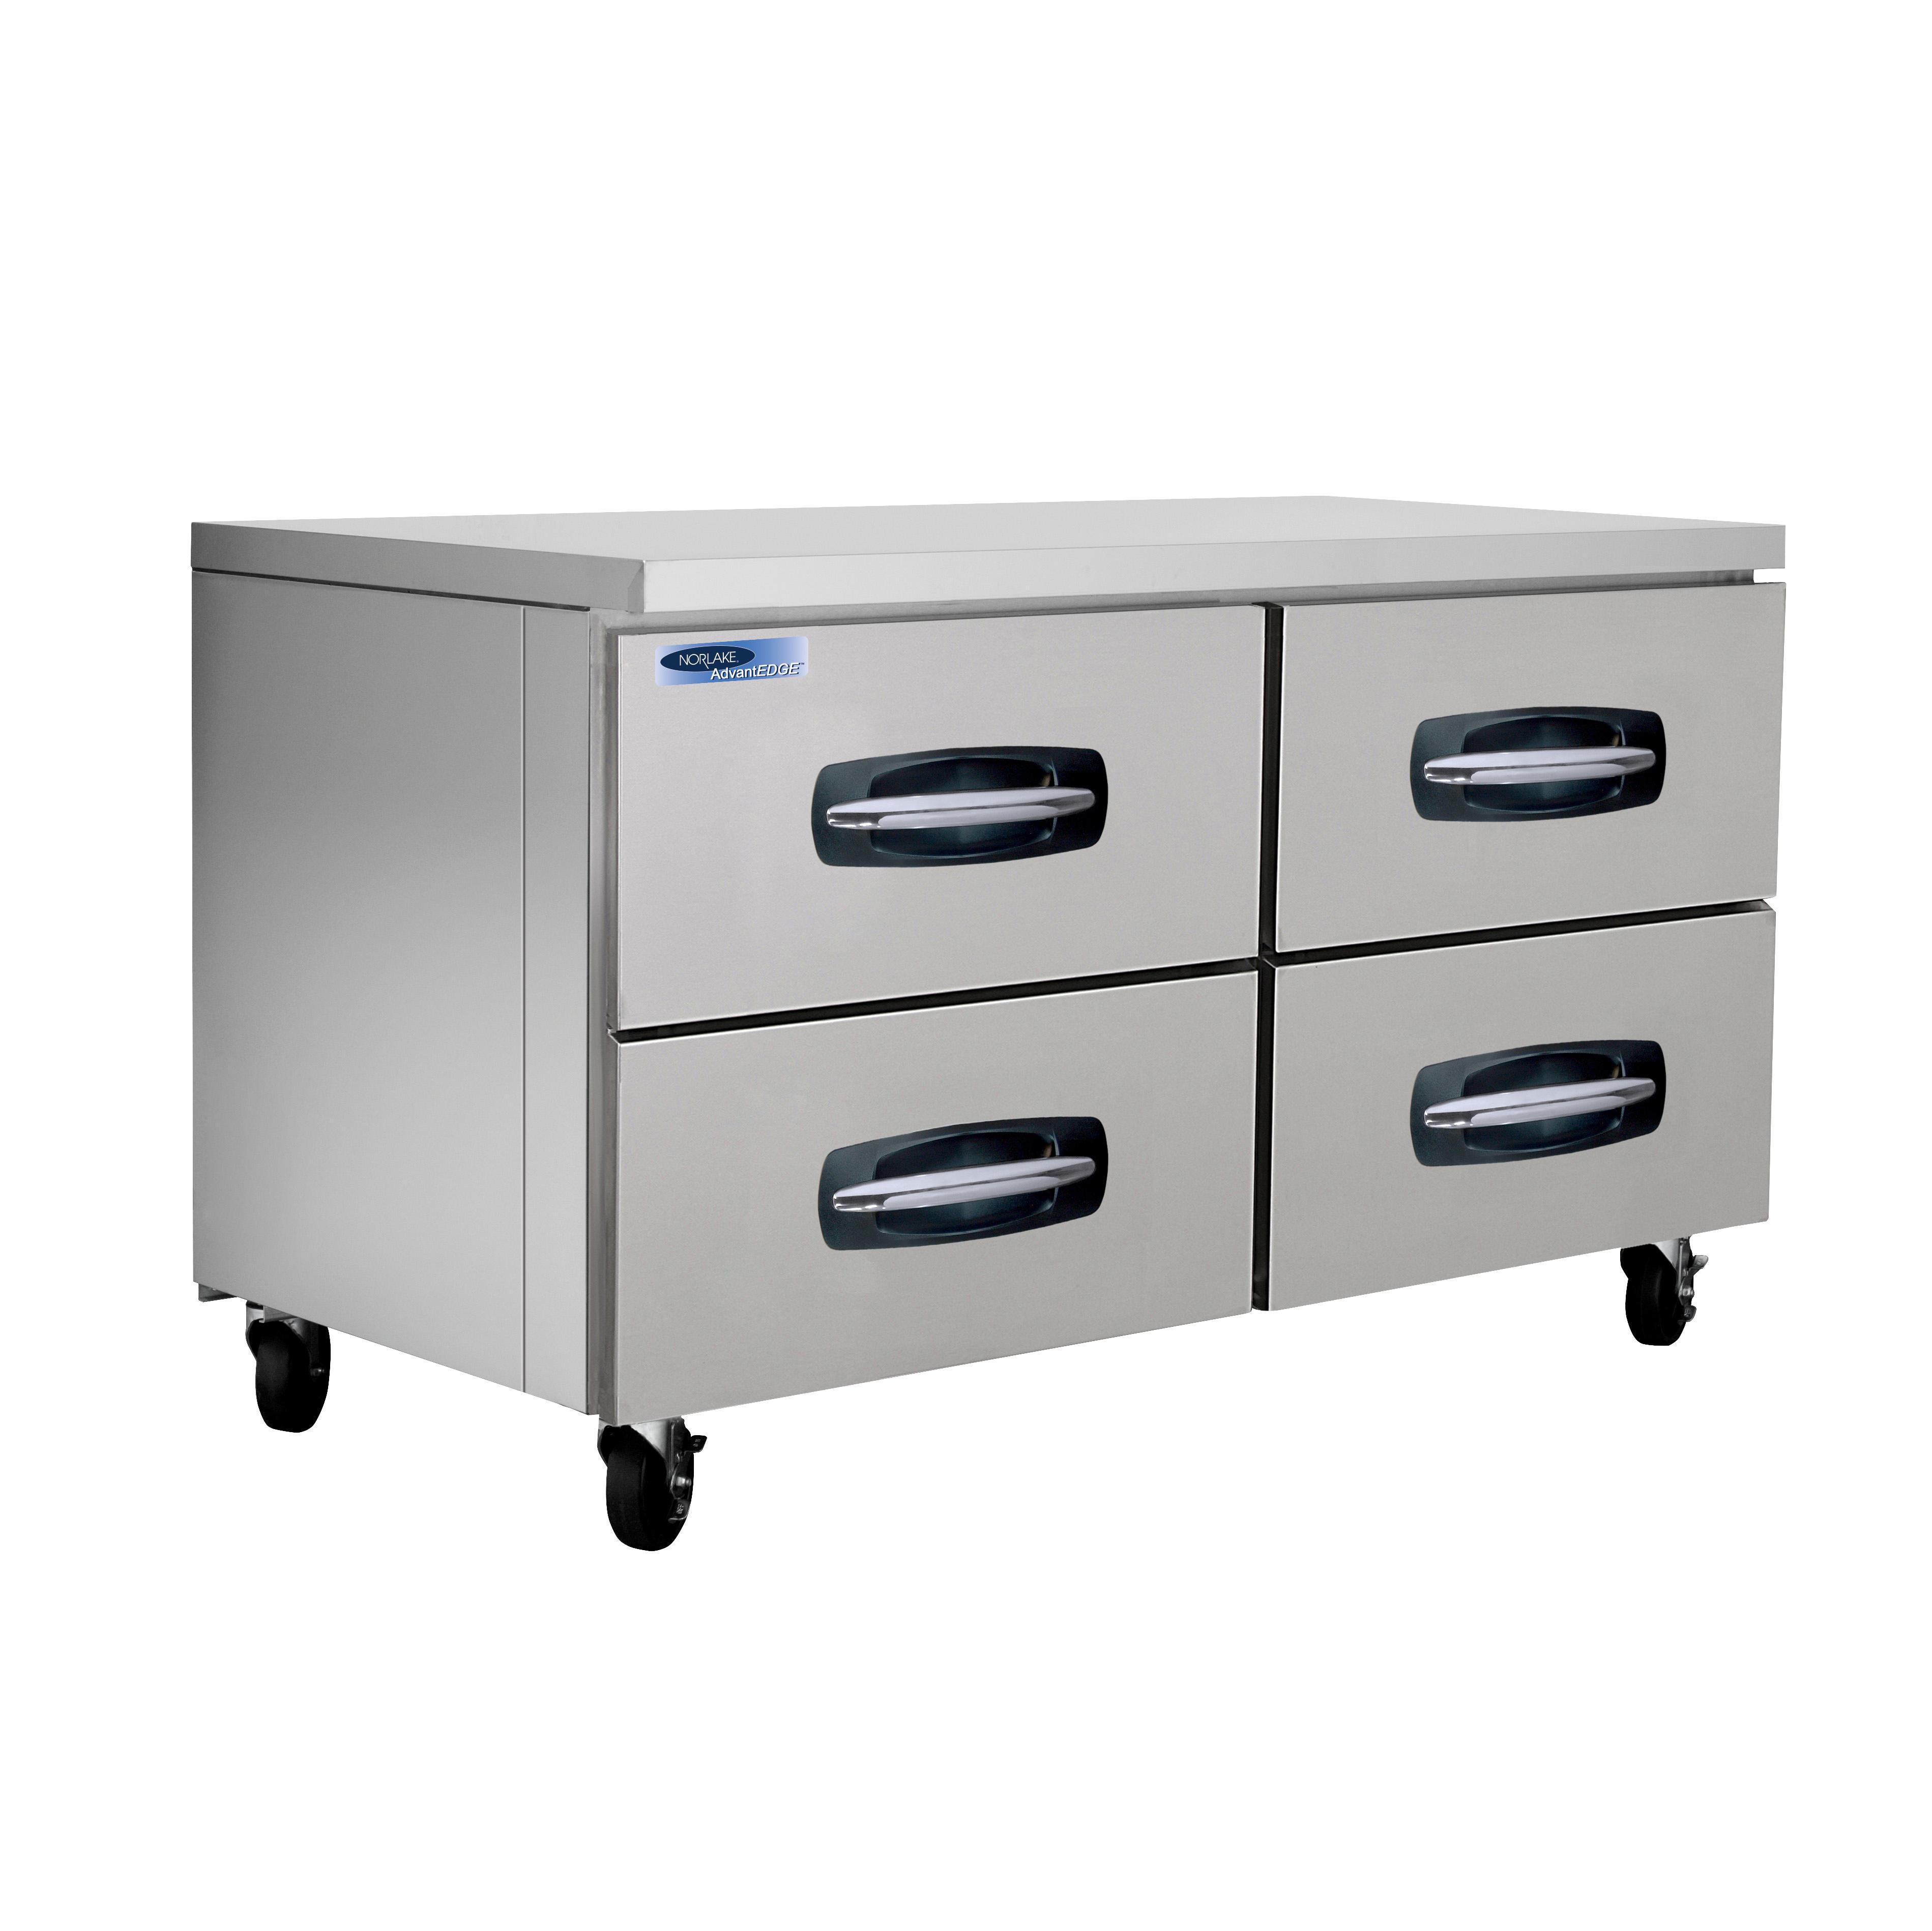 Nor-Lake NLUR60A-001B refrigerator, undercounter, reach-in